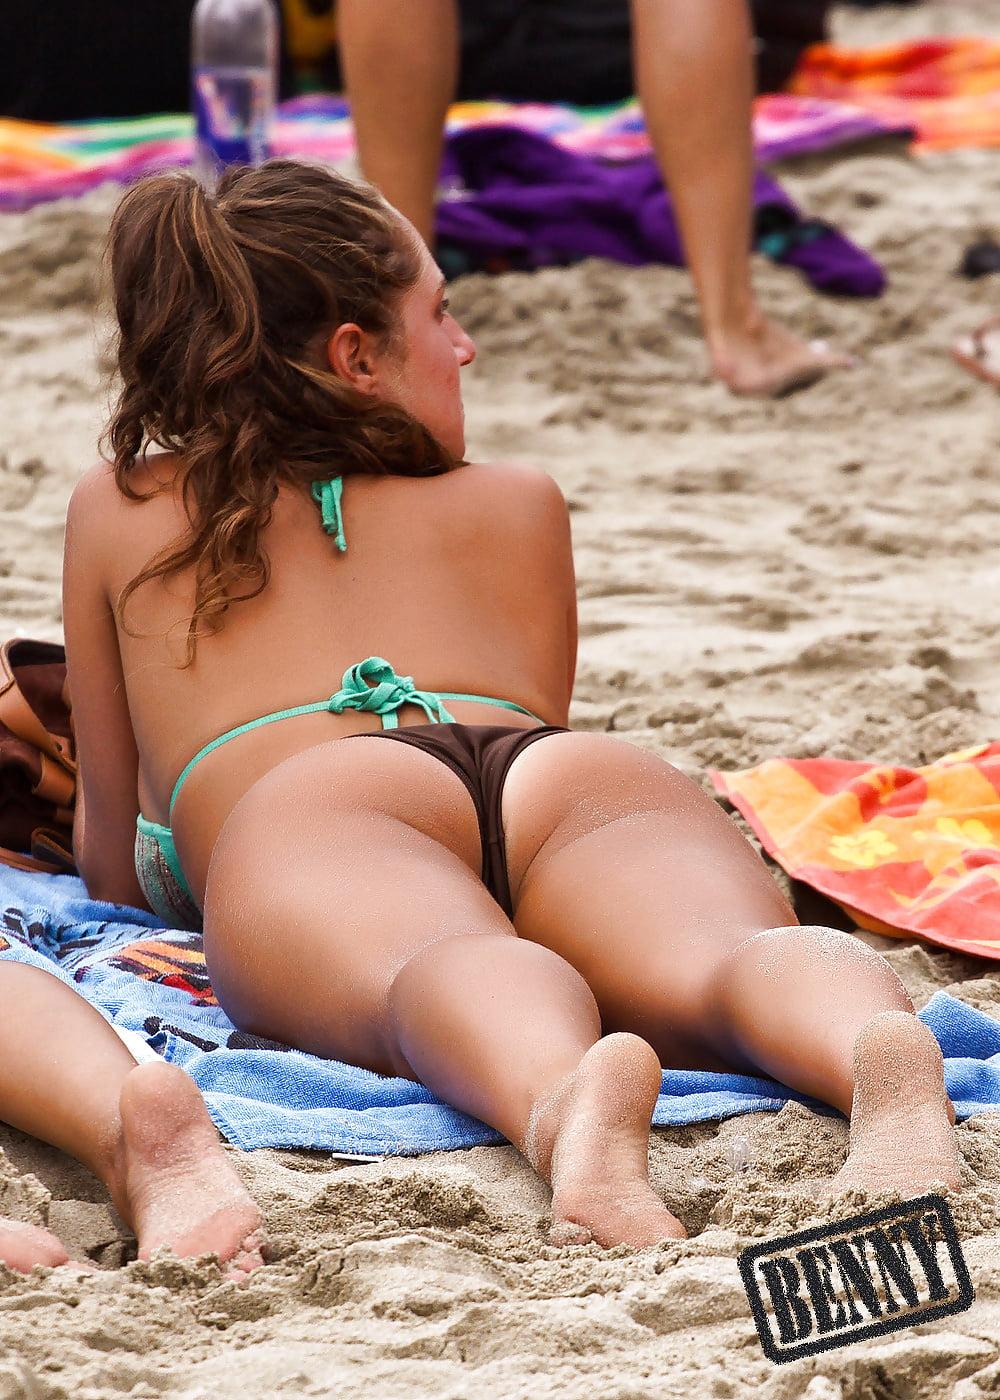 Voyeurism bikini